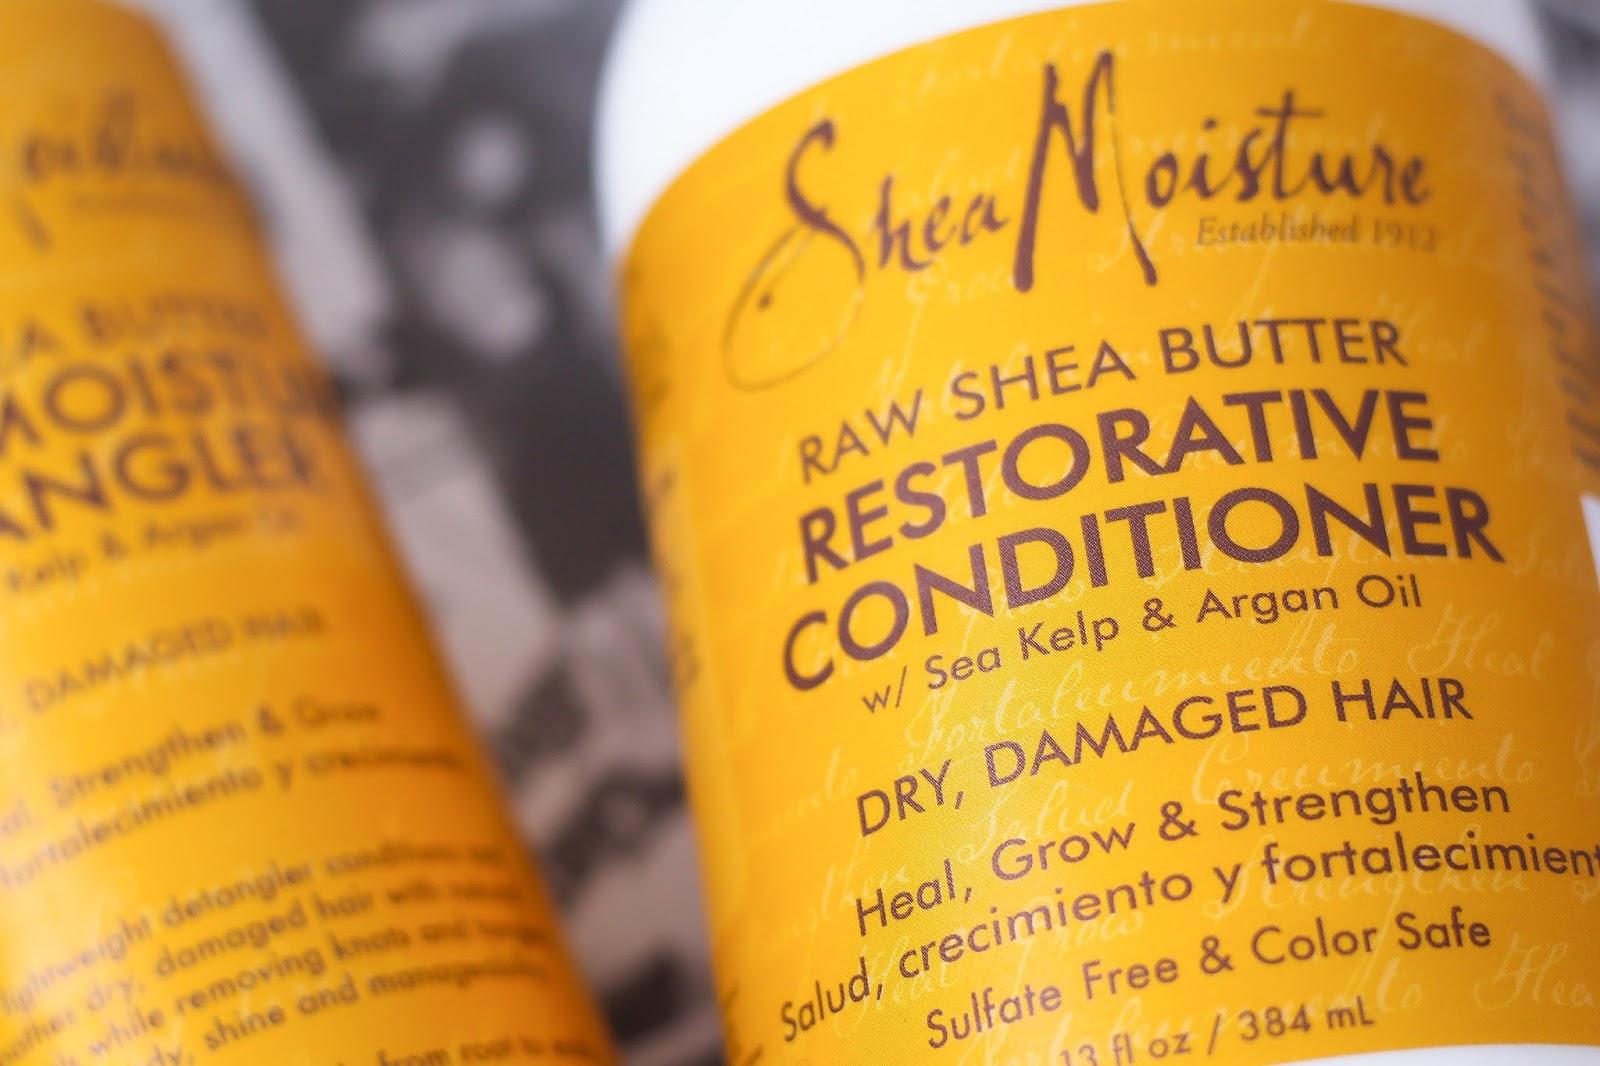 Shea Moisture Raw Shea Butter Restorative Conditioner